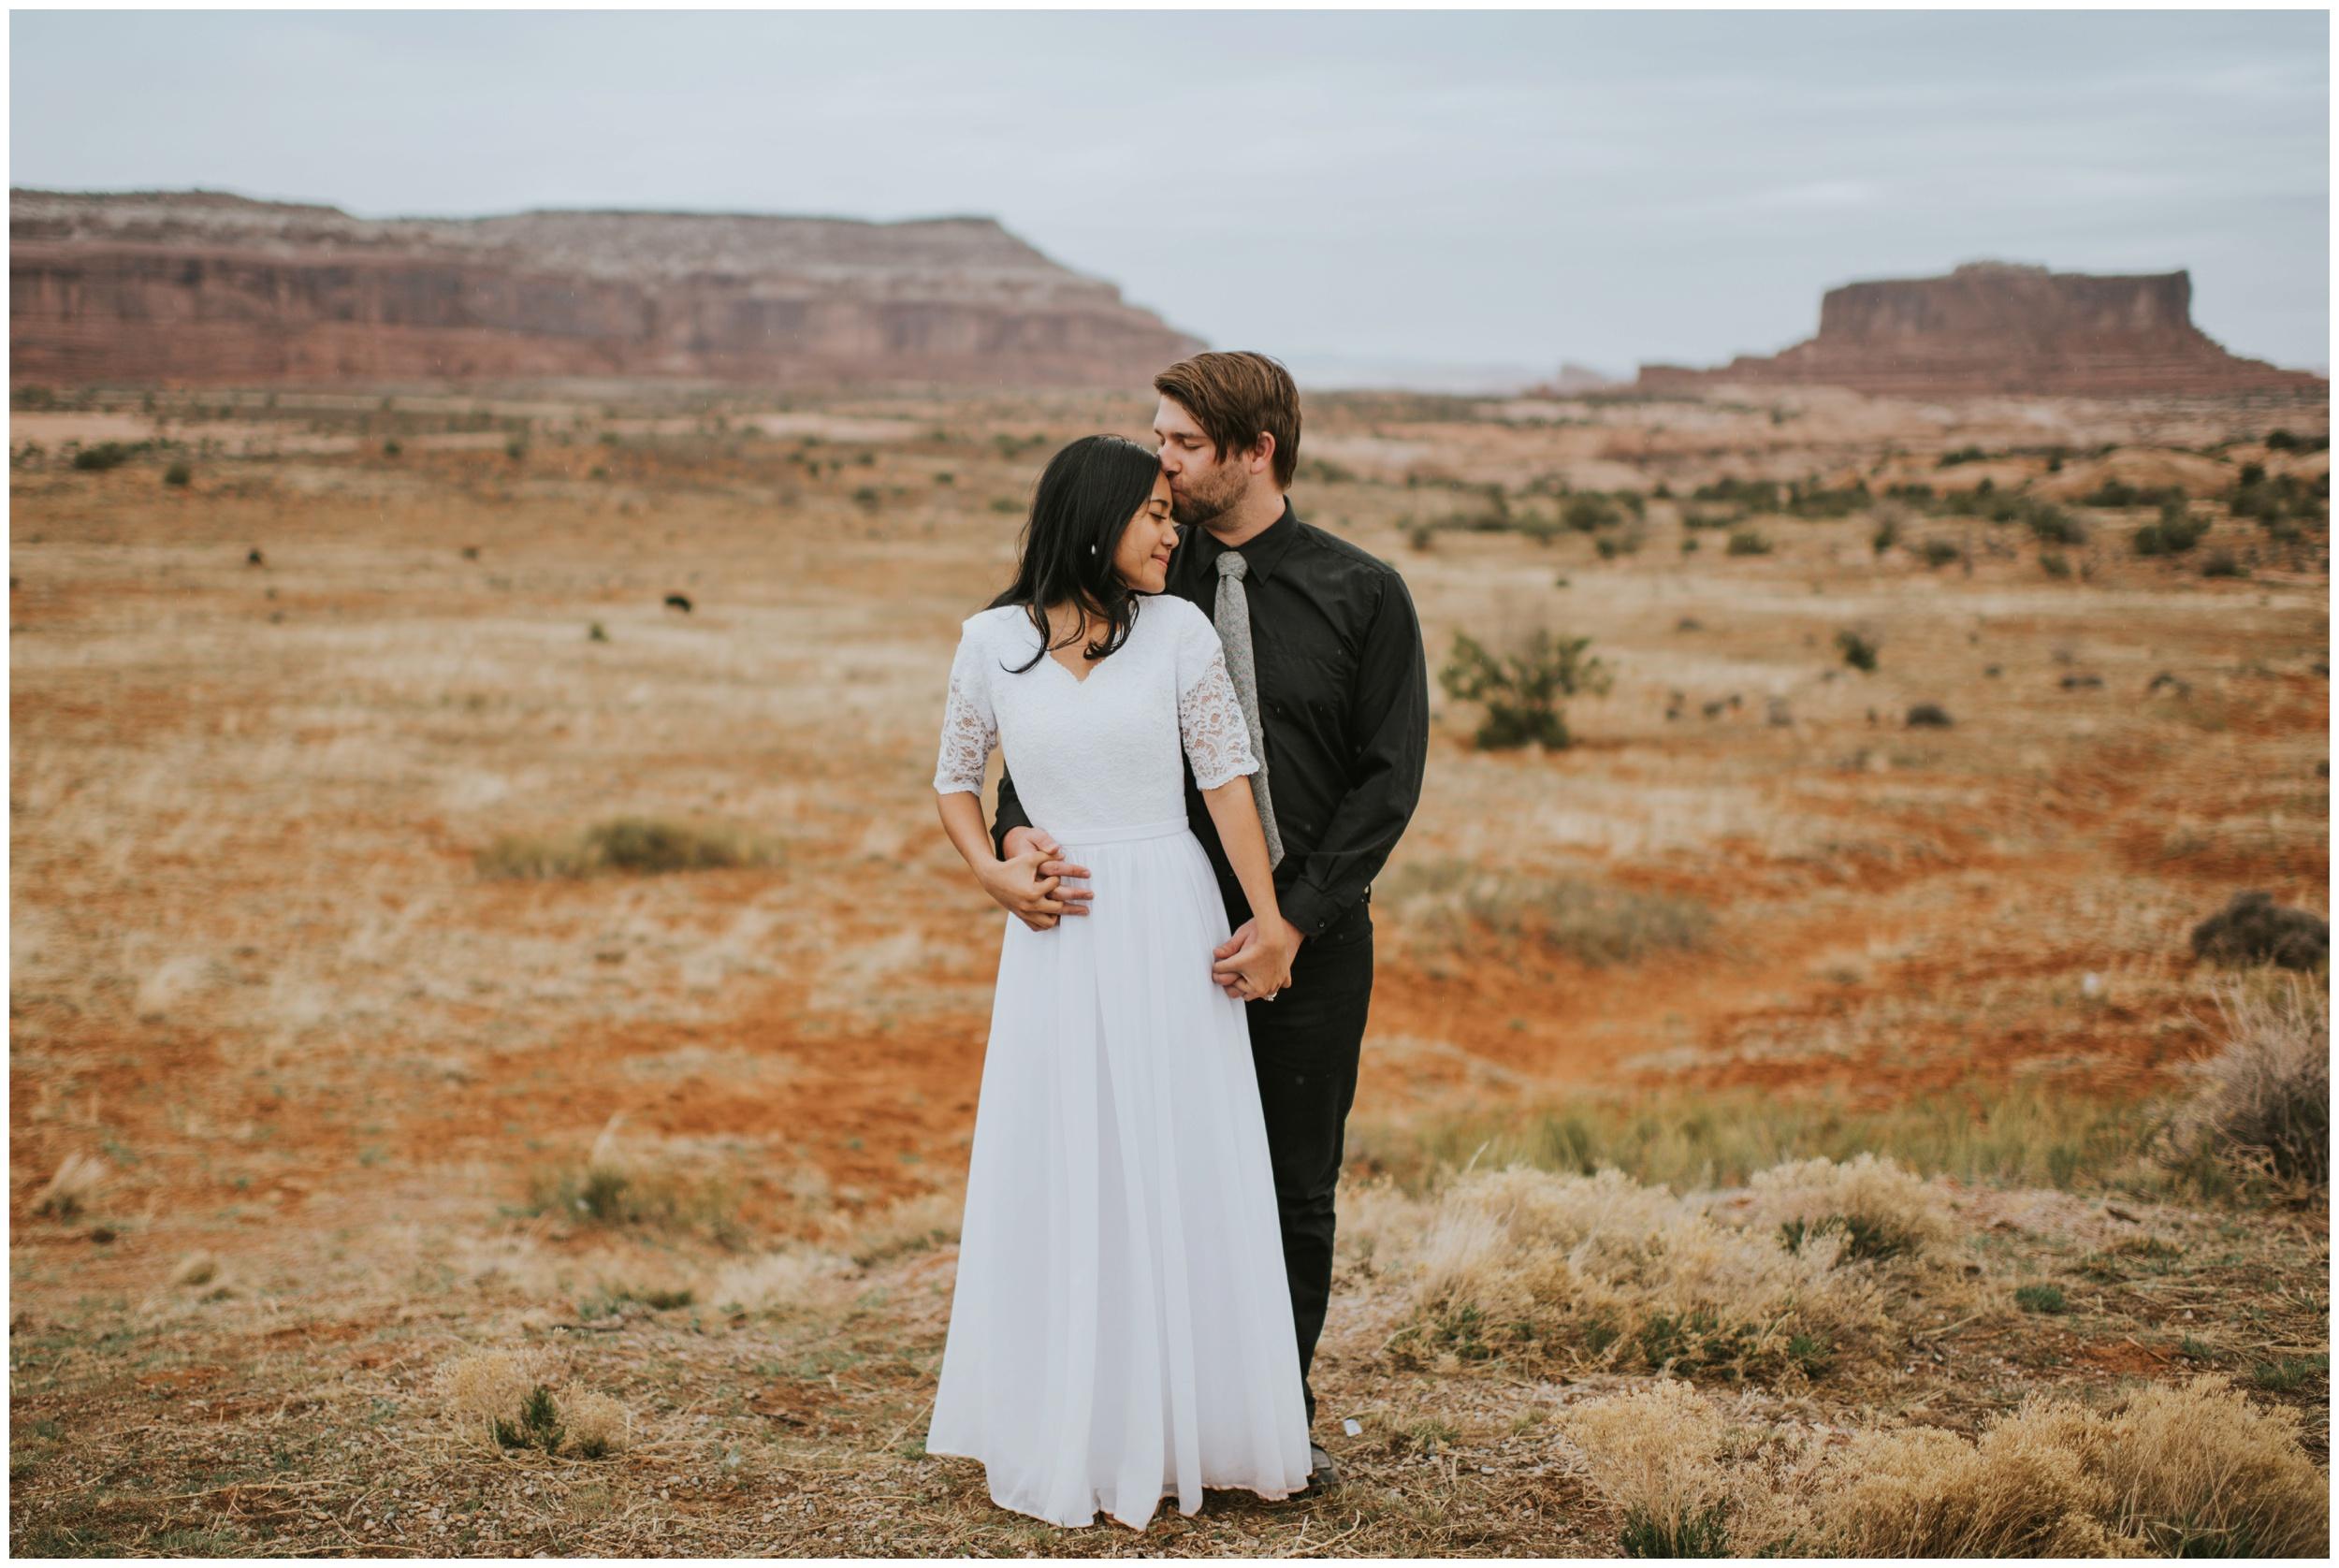 Tender moment during bridal portraits of groom kissing brides forehead |Moab Utah, Photographer www.riversandroadsphotography.com